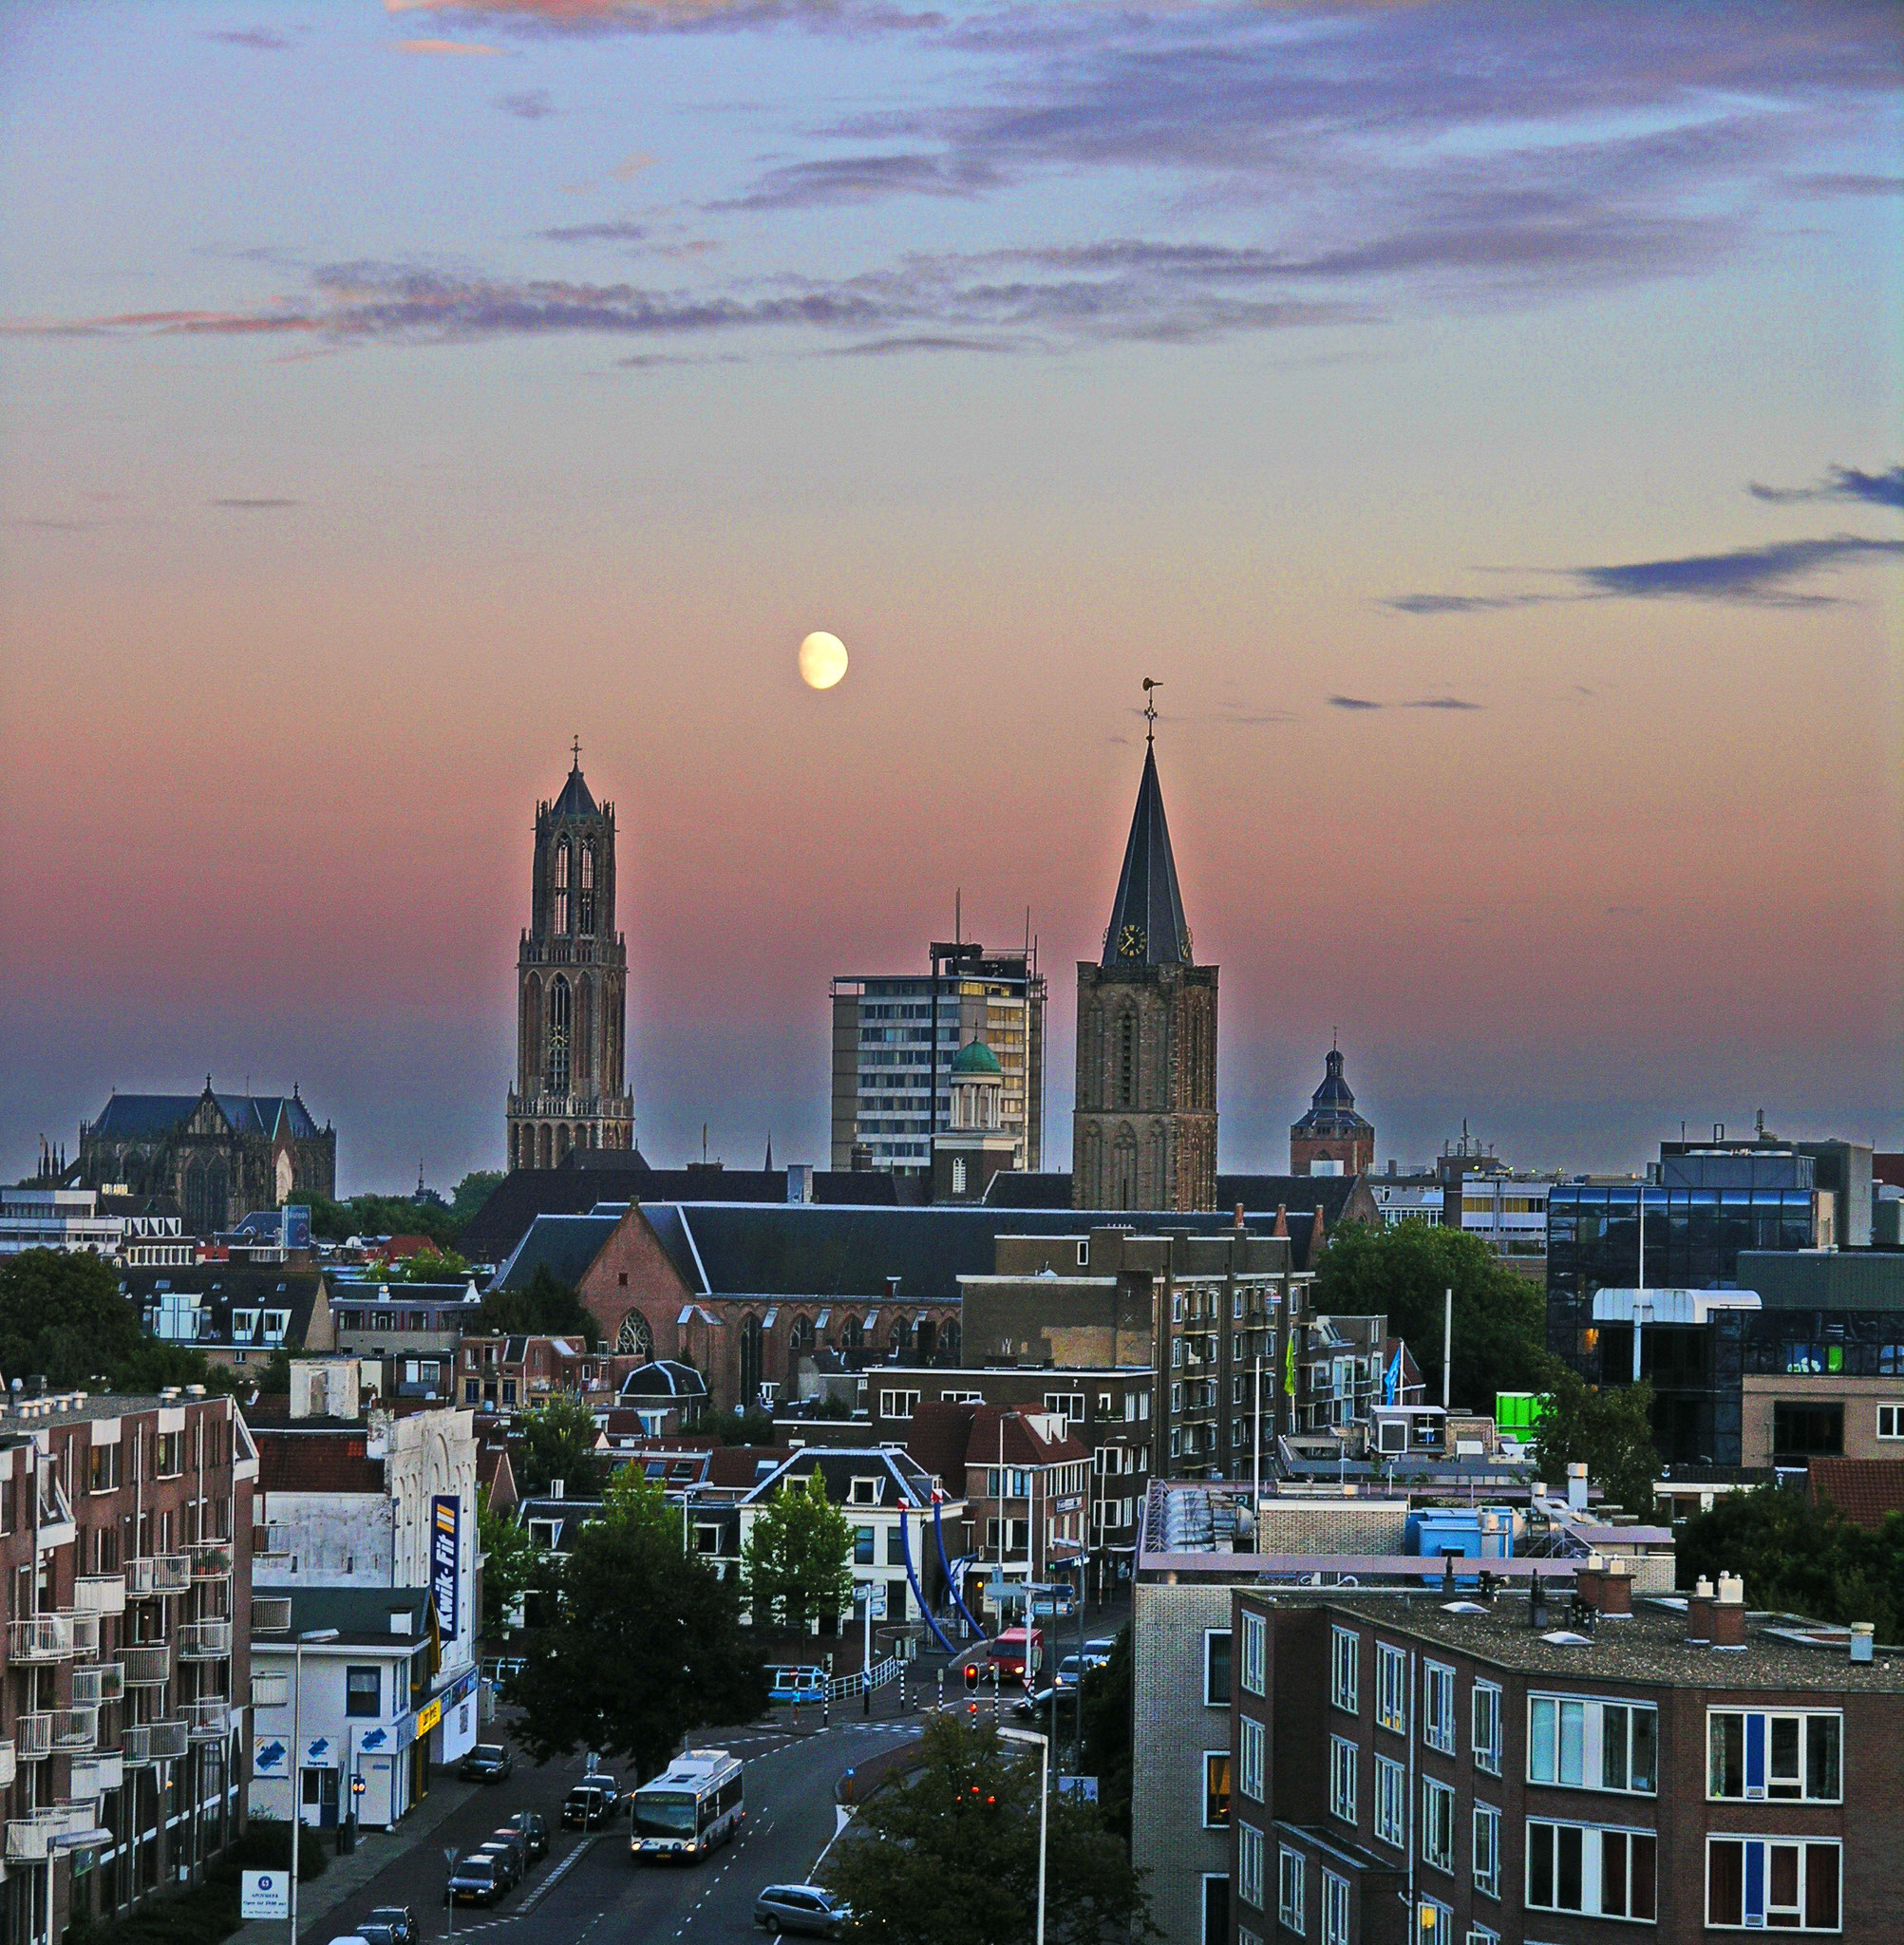 069-Iurie FOCA (Chișinău - MD) - Utrecht (NL)